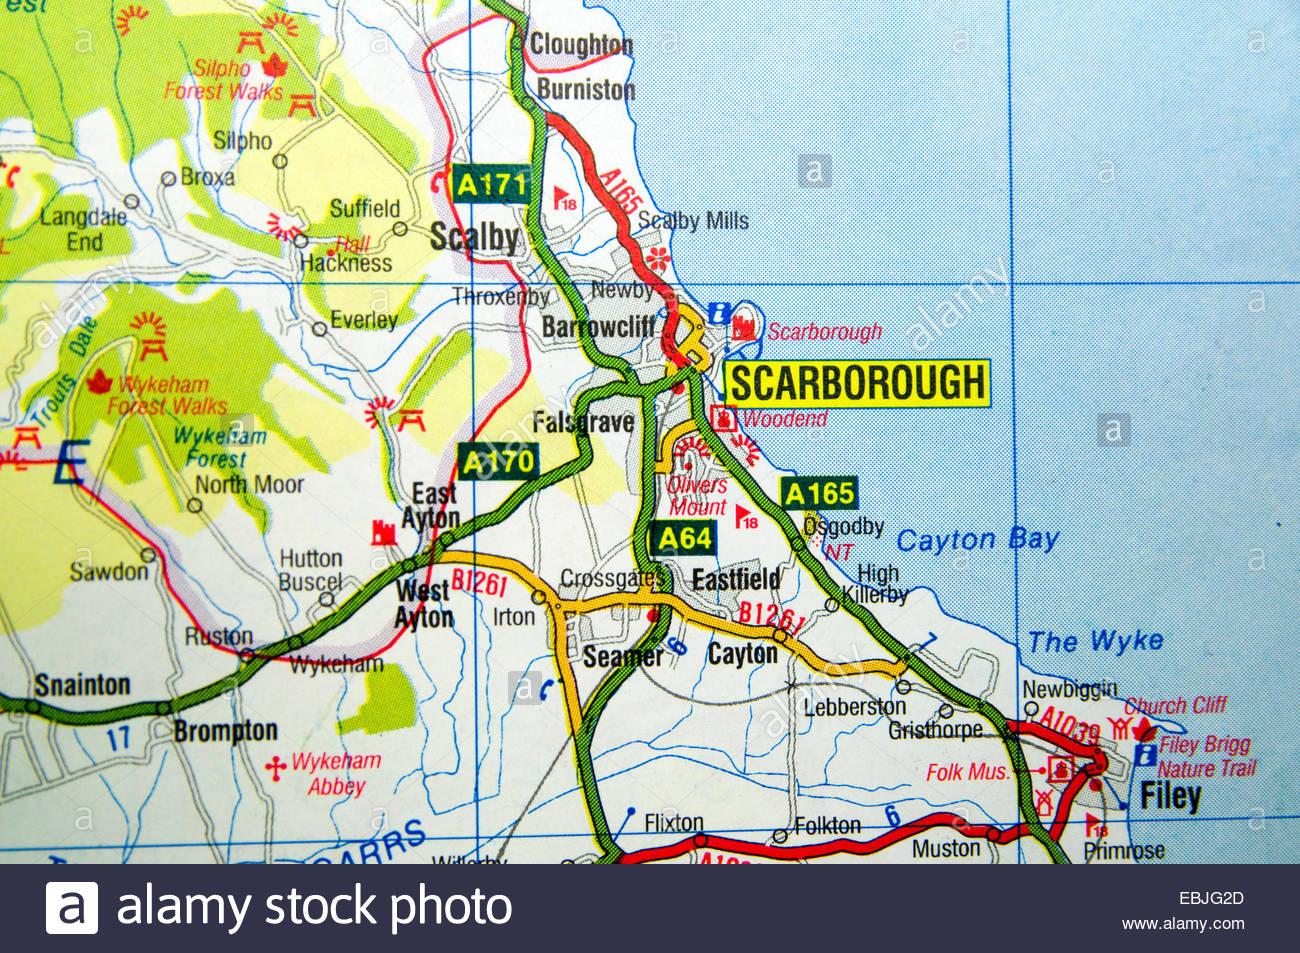 Road Map Of Scarborough England Stock Photo 76010437 Alamy